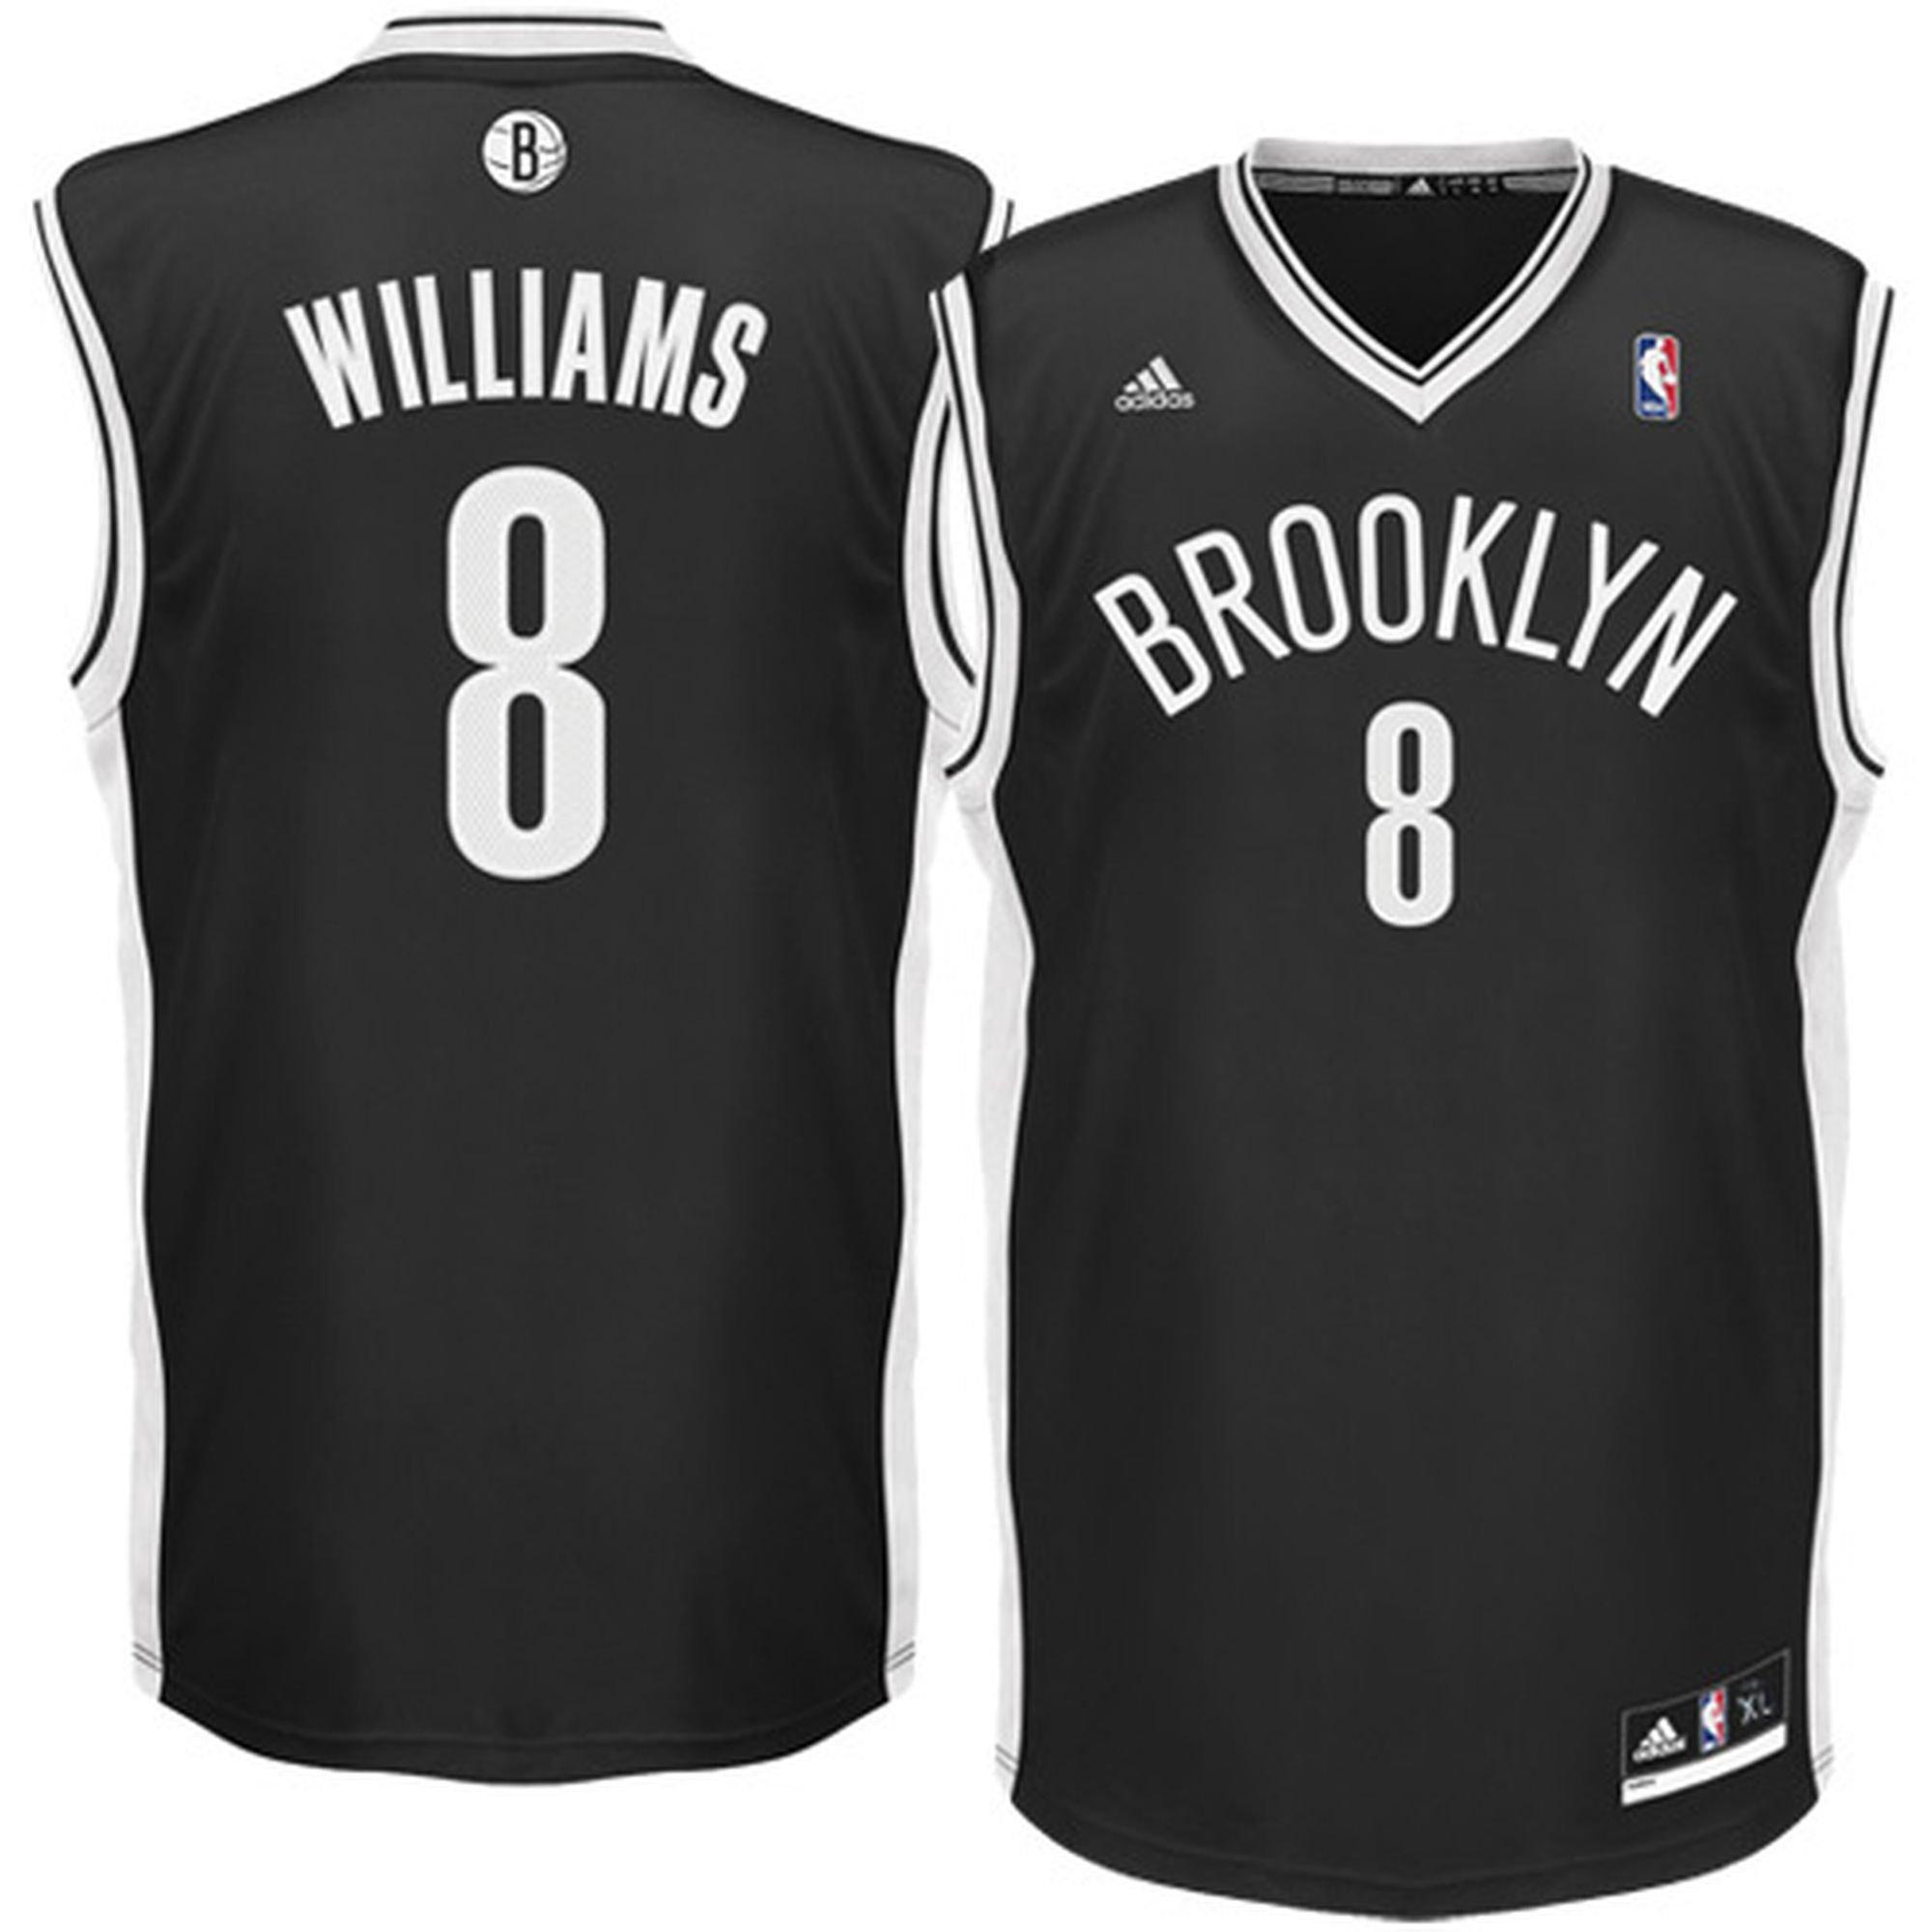 Deron Williams Youth Brooklyn Nets Black Replica Basketball Jersey